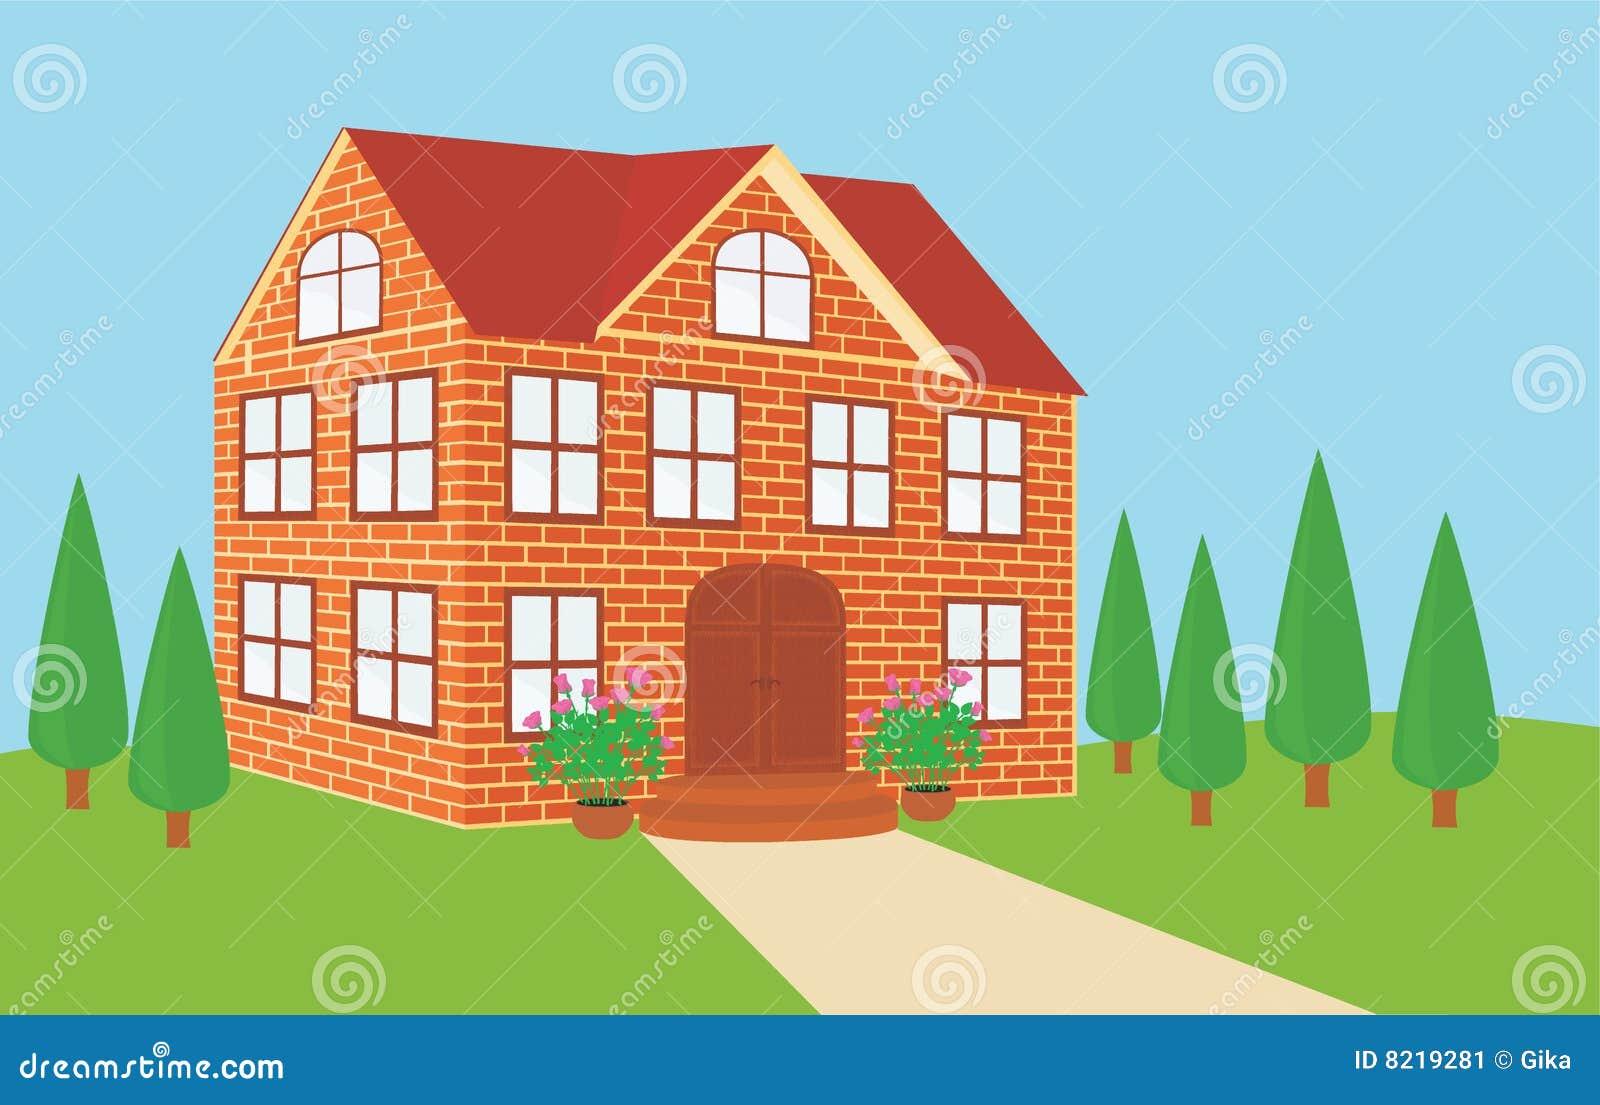 home cartoon brick - photo #8